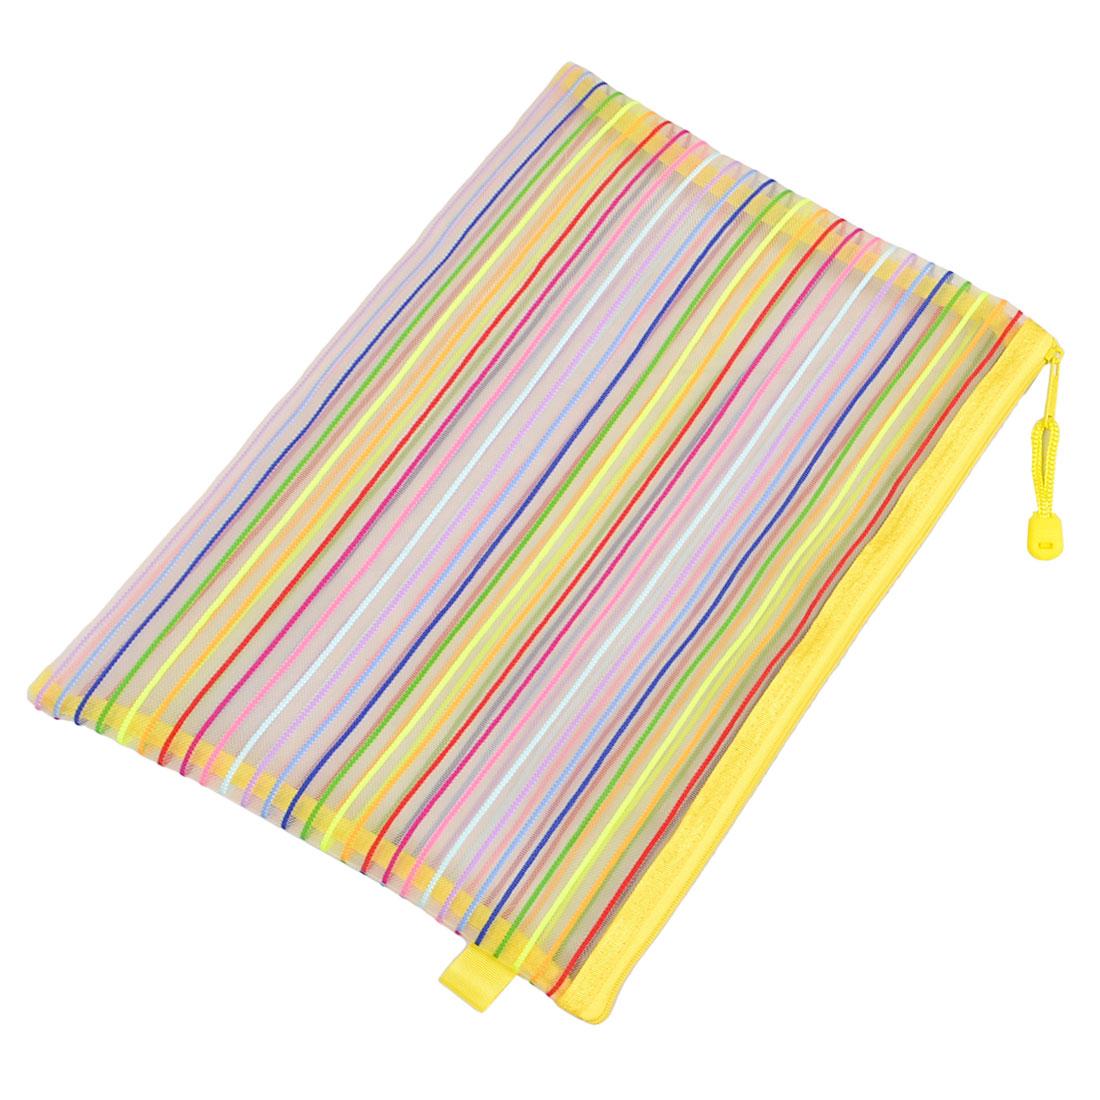 Zip up Nylon Mesh Multicolor Stripes A4 Paper Documents Pen File Bag Storage Folder